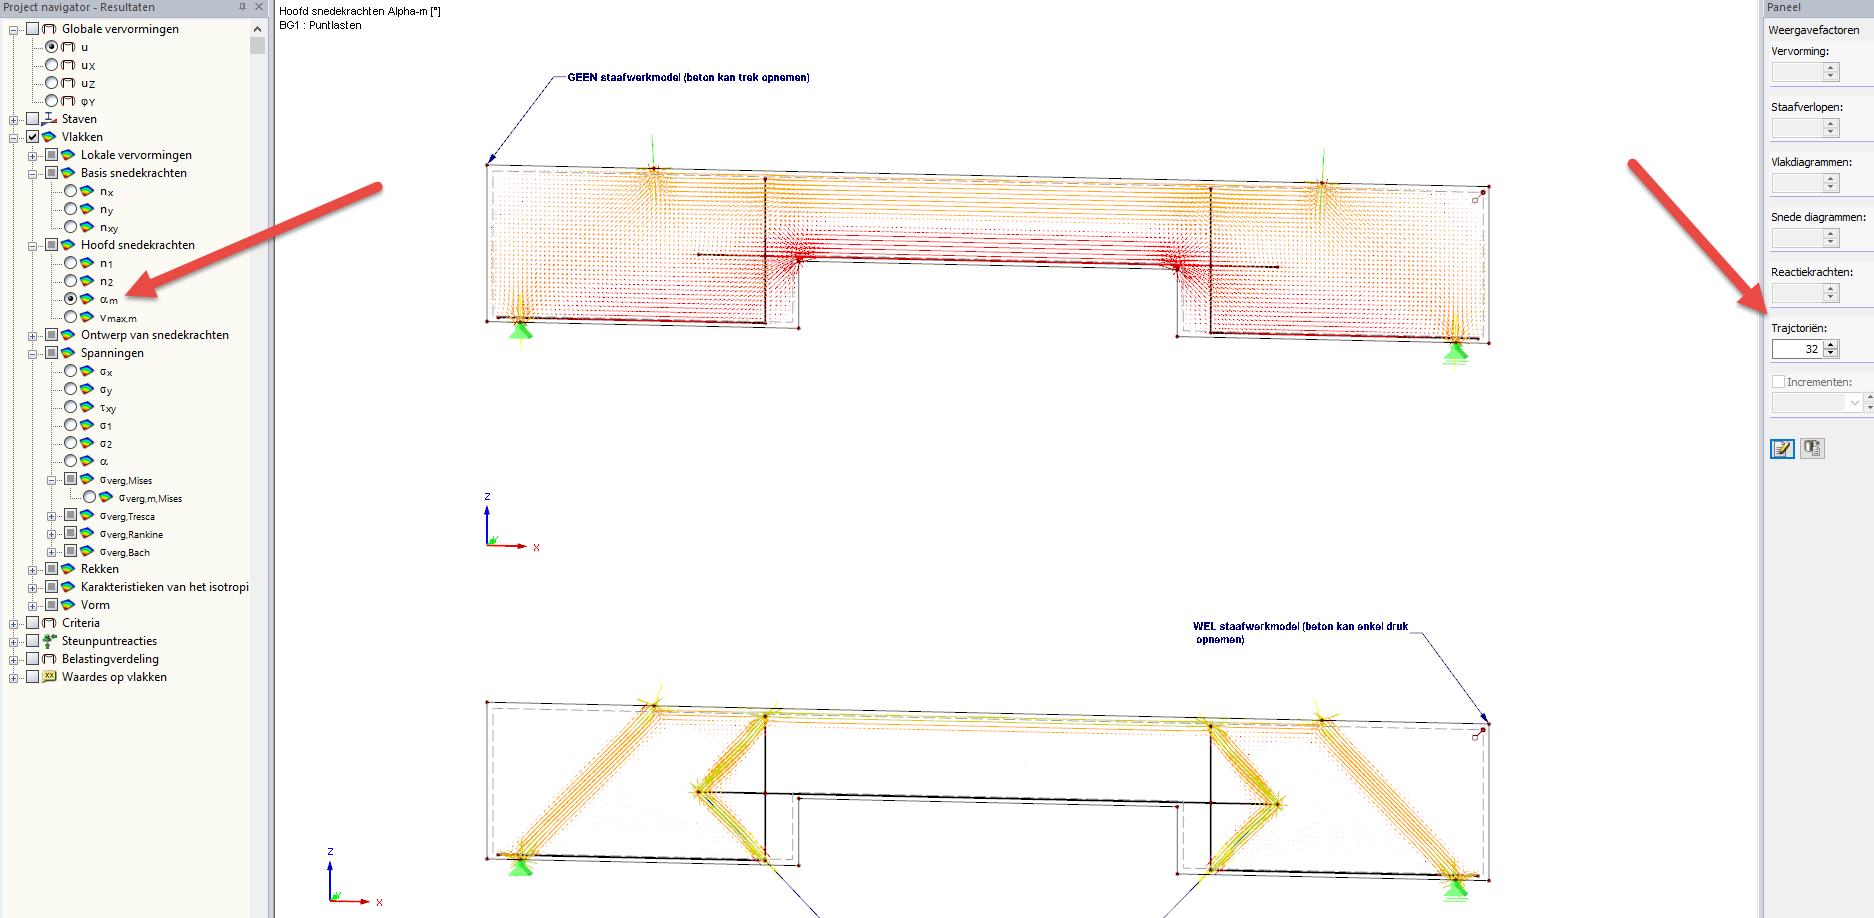 Staafwerkmodellen in betonwanden / Vakwerkanalogie